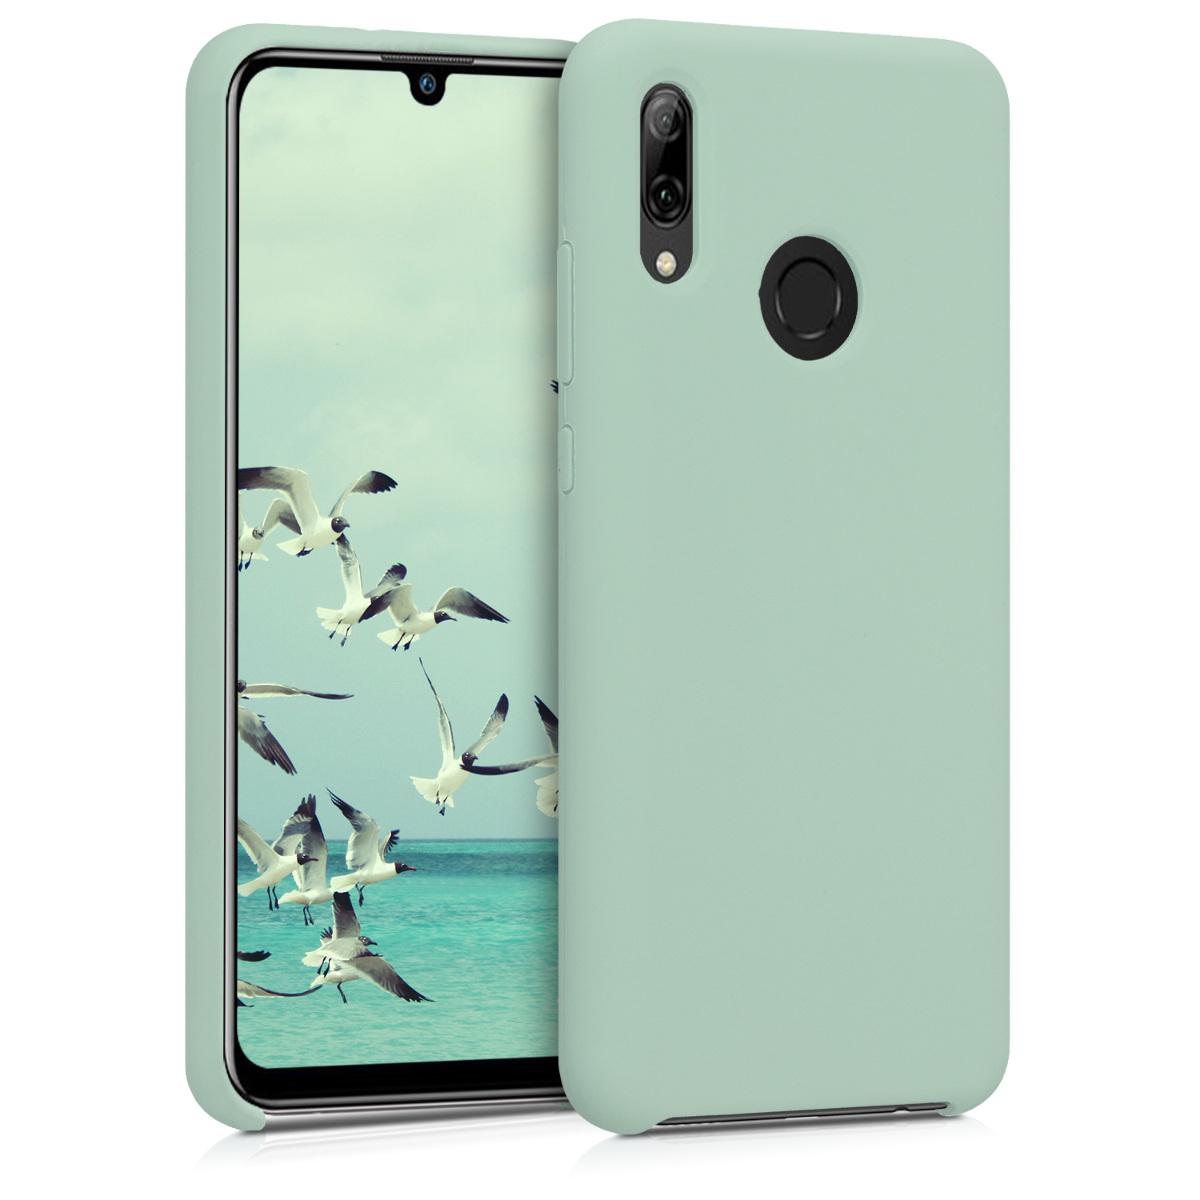 KW Θήκη Σιλικόνης Huawei P Smart (2019) - Soft Flexible Rubber  - Mint Matte (47824.50)